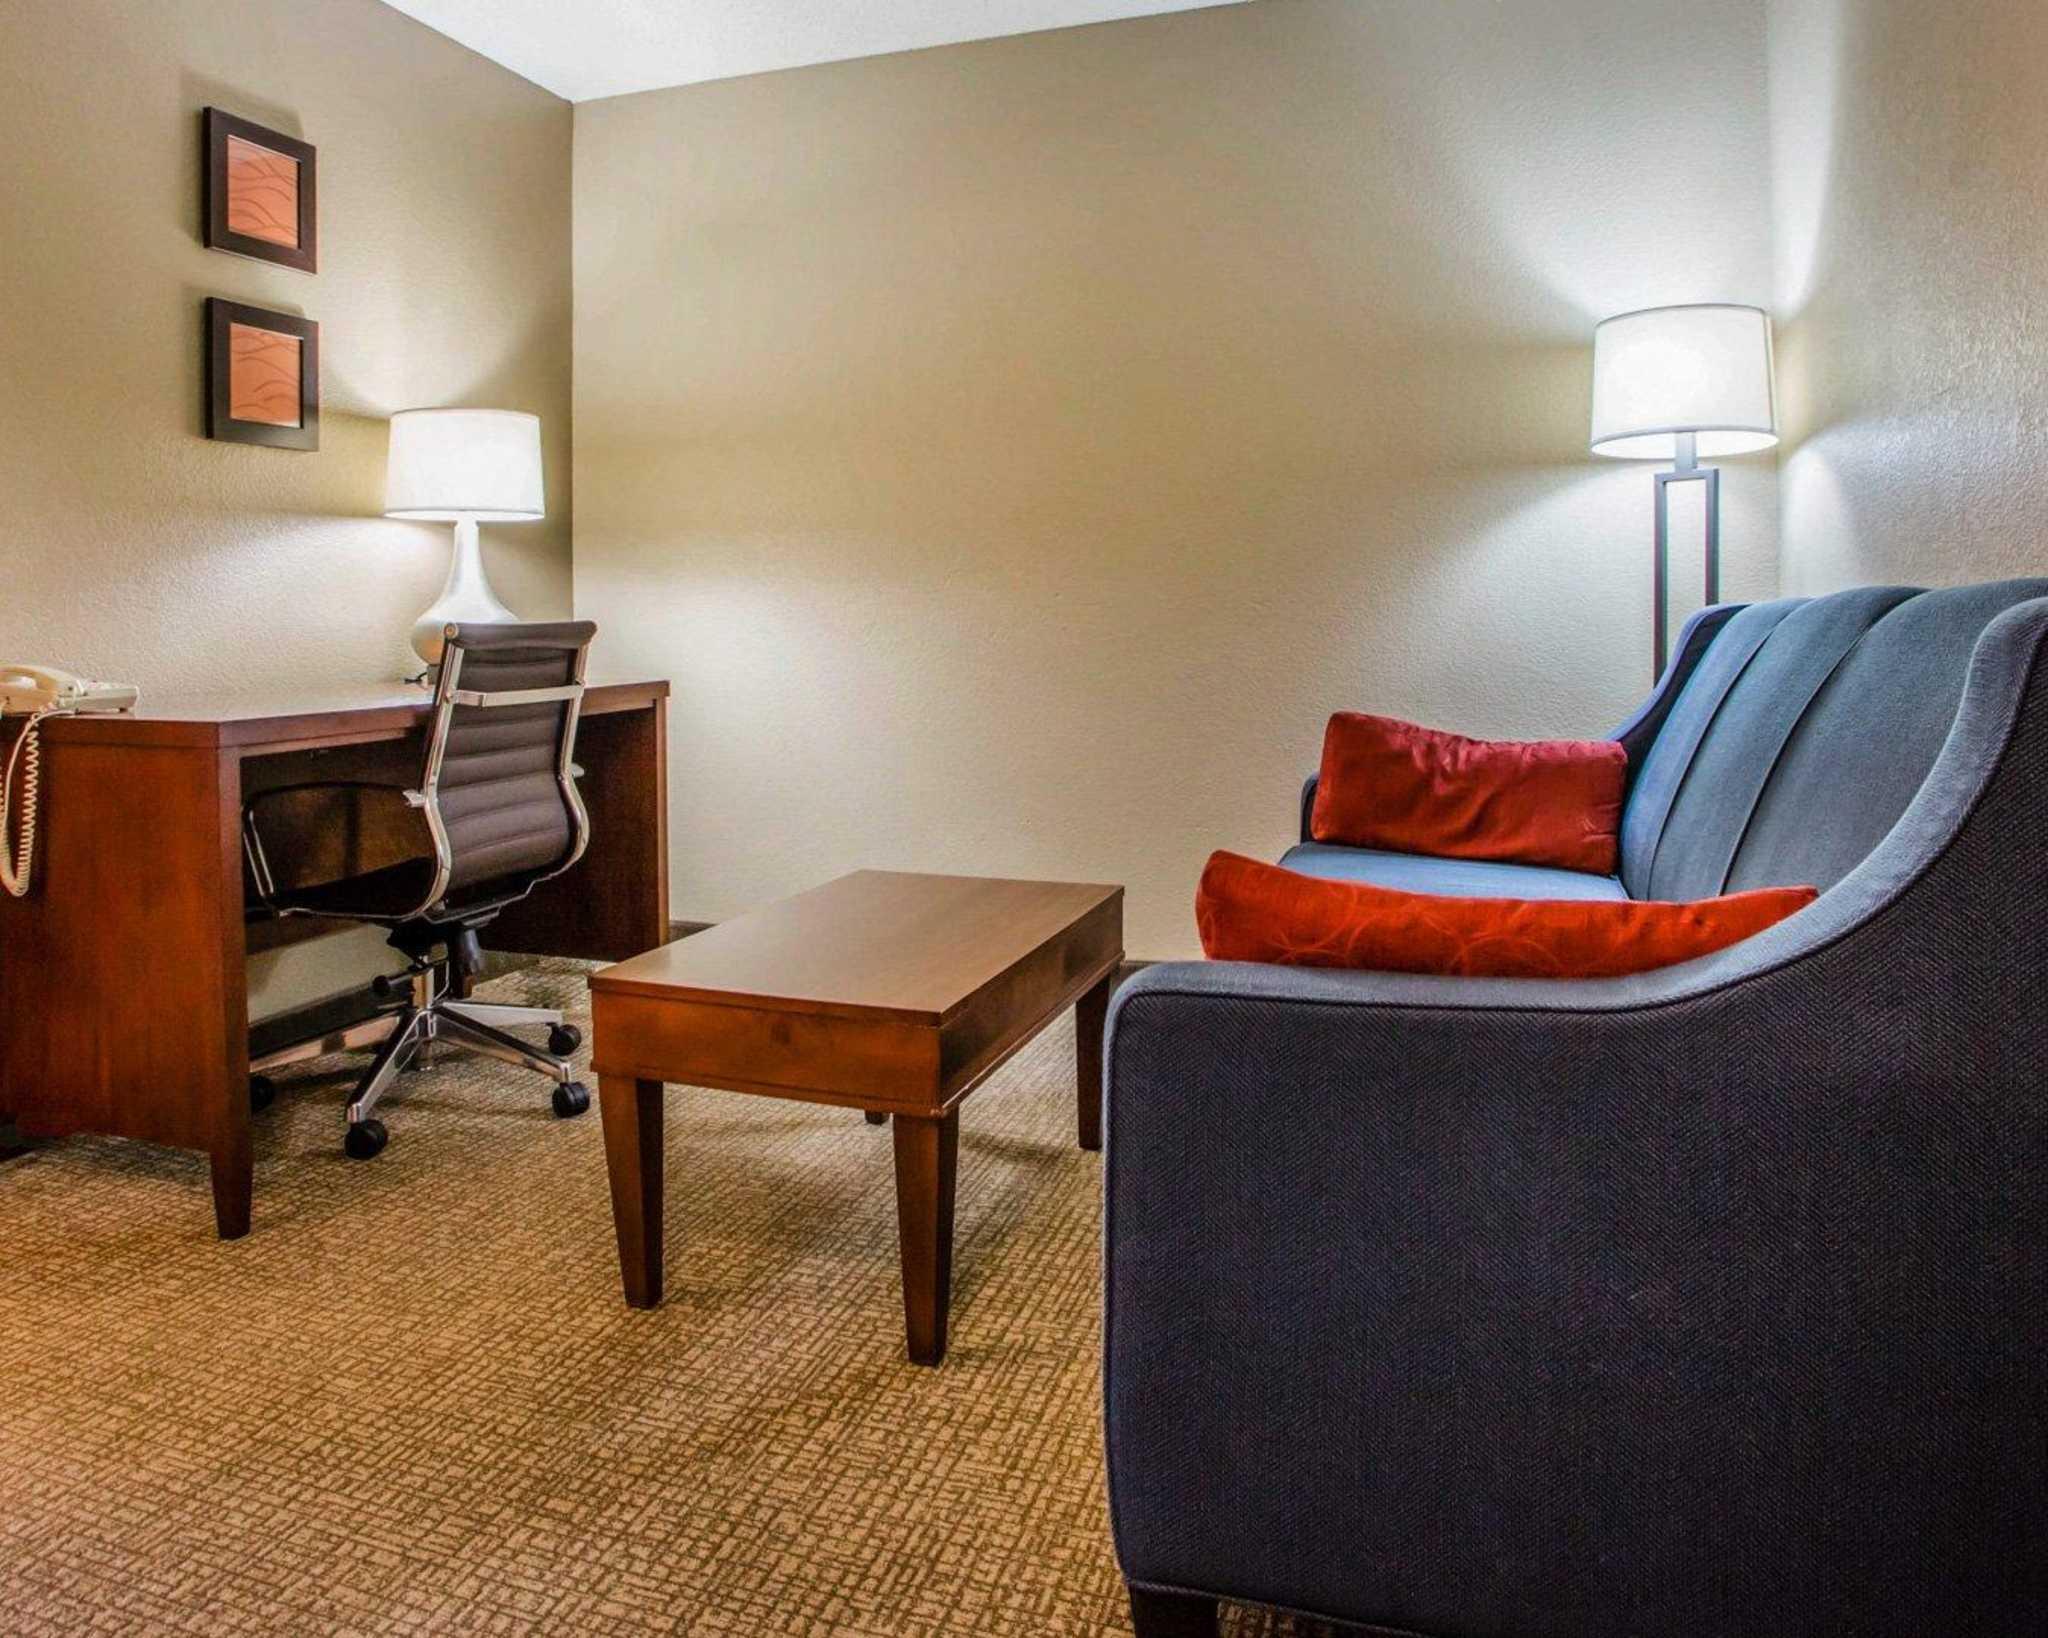 Comfort Inn & Suites Jackson - West Bend image 27